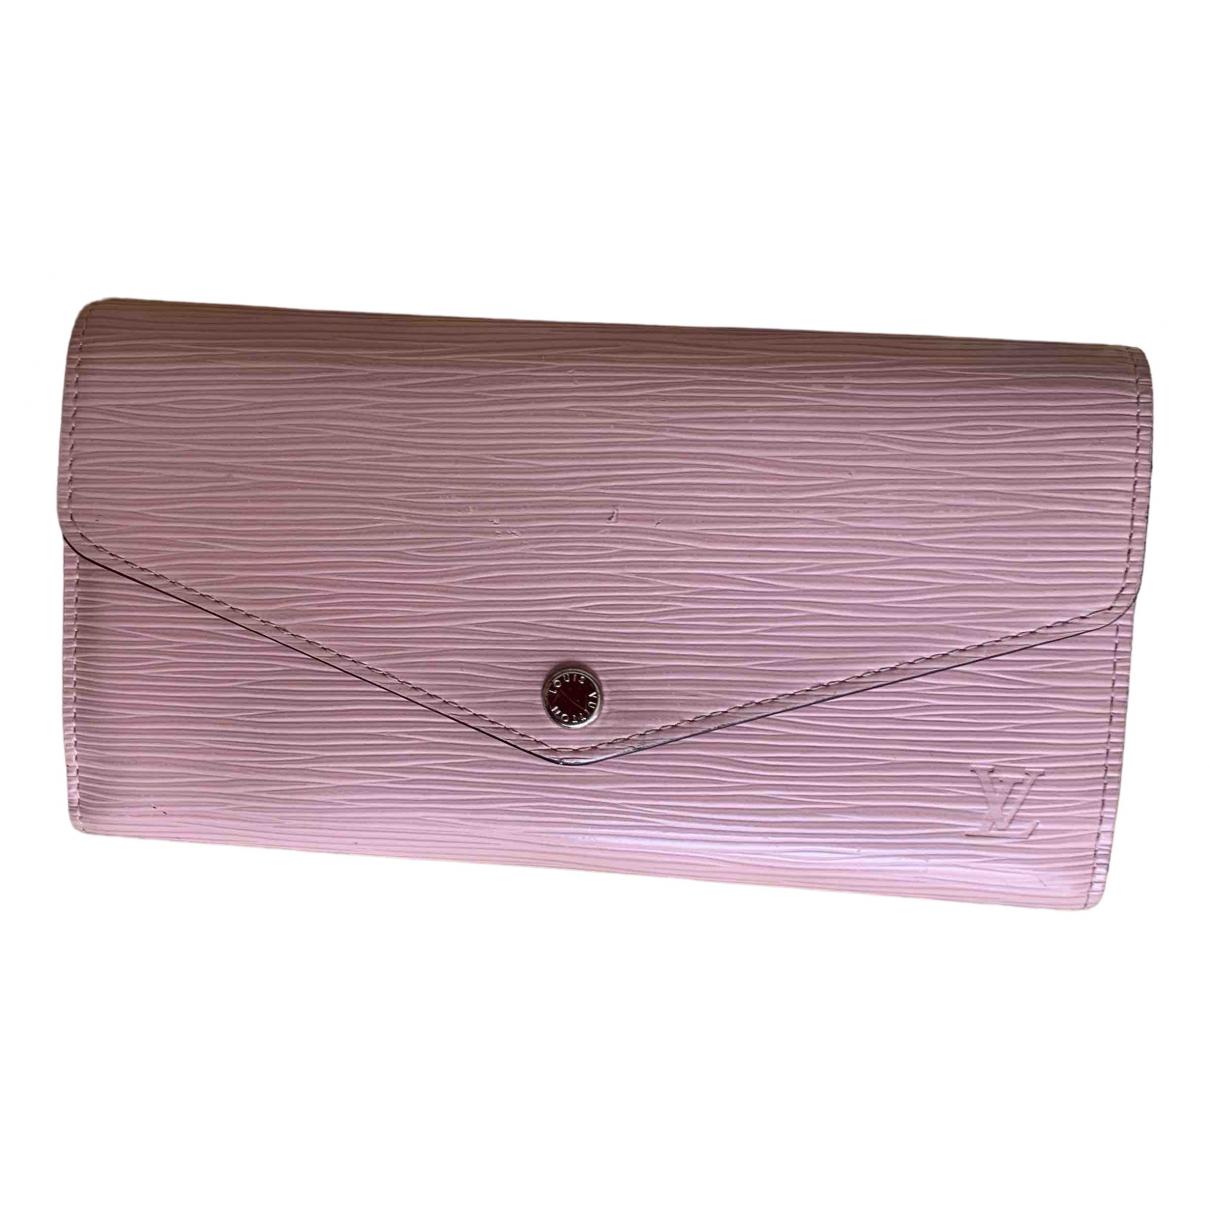 Louis Vuitton Sarah Pink Leather wallet for Women \N